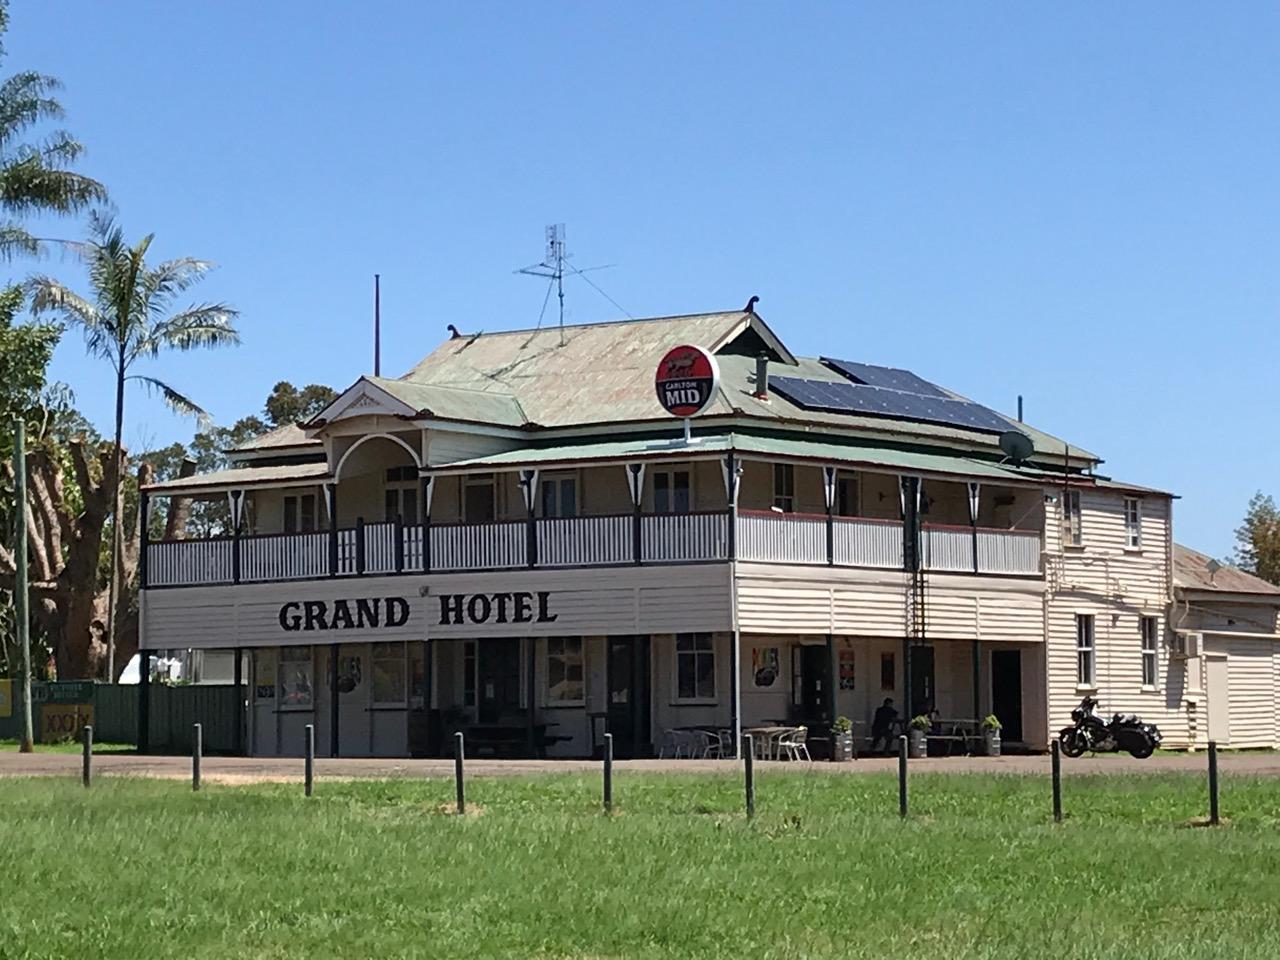 20181020 grand hotel IMG_0443